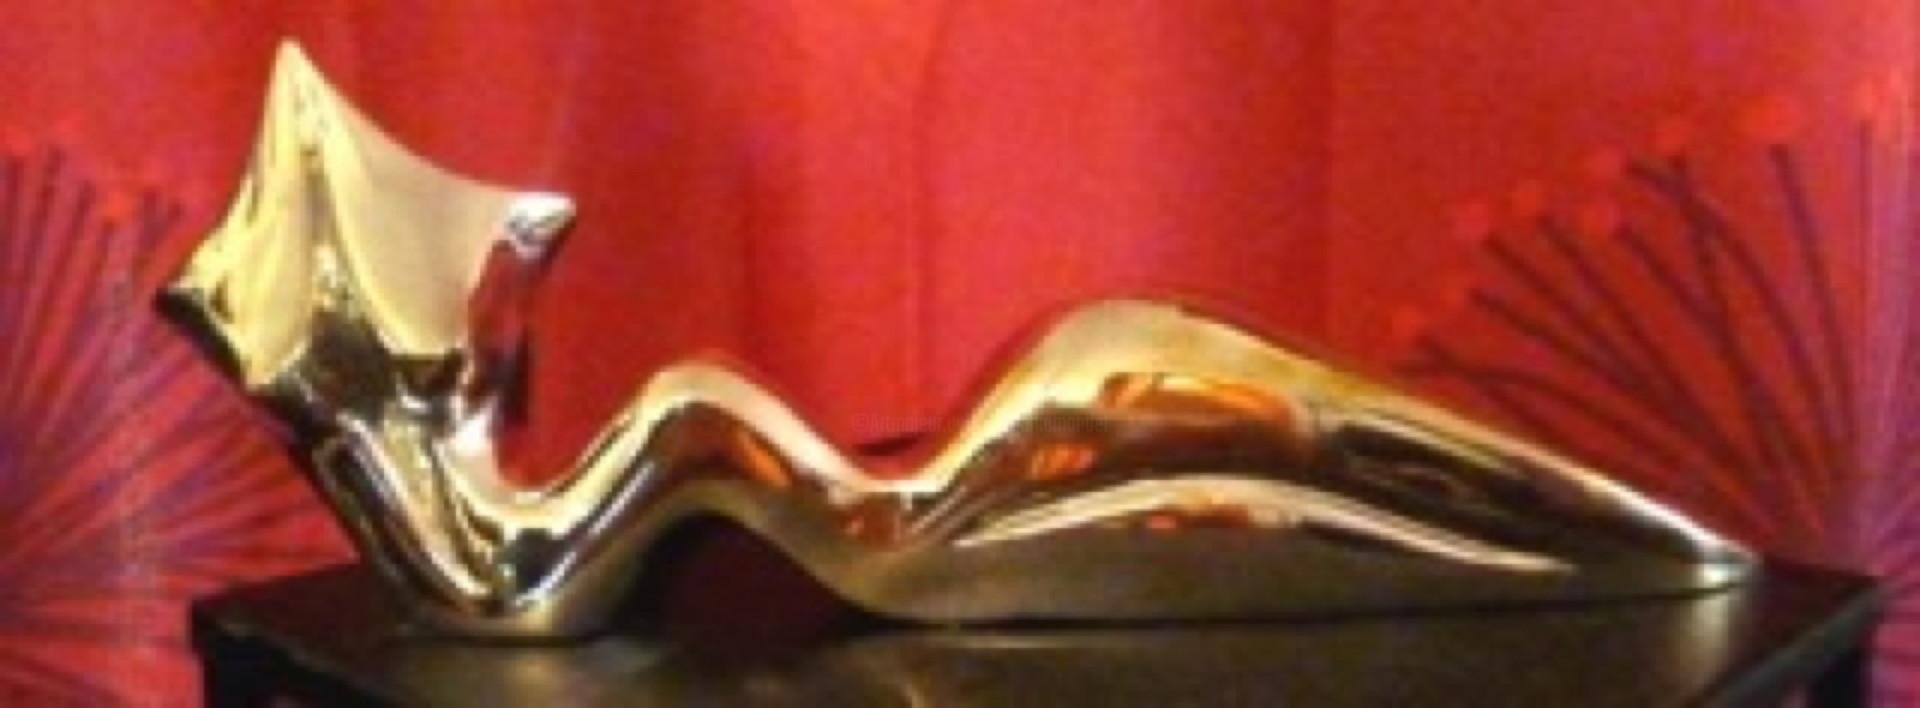 Mandel Sonia - ONDULINE Bronze poli 2/8